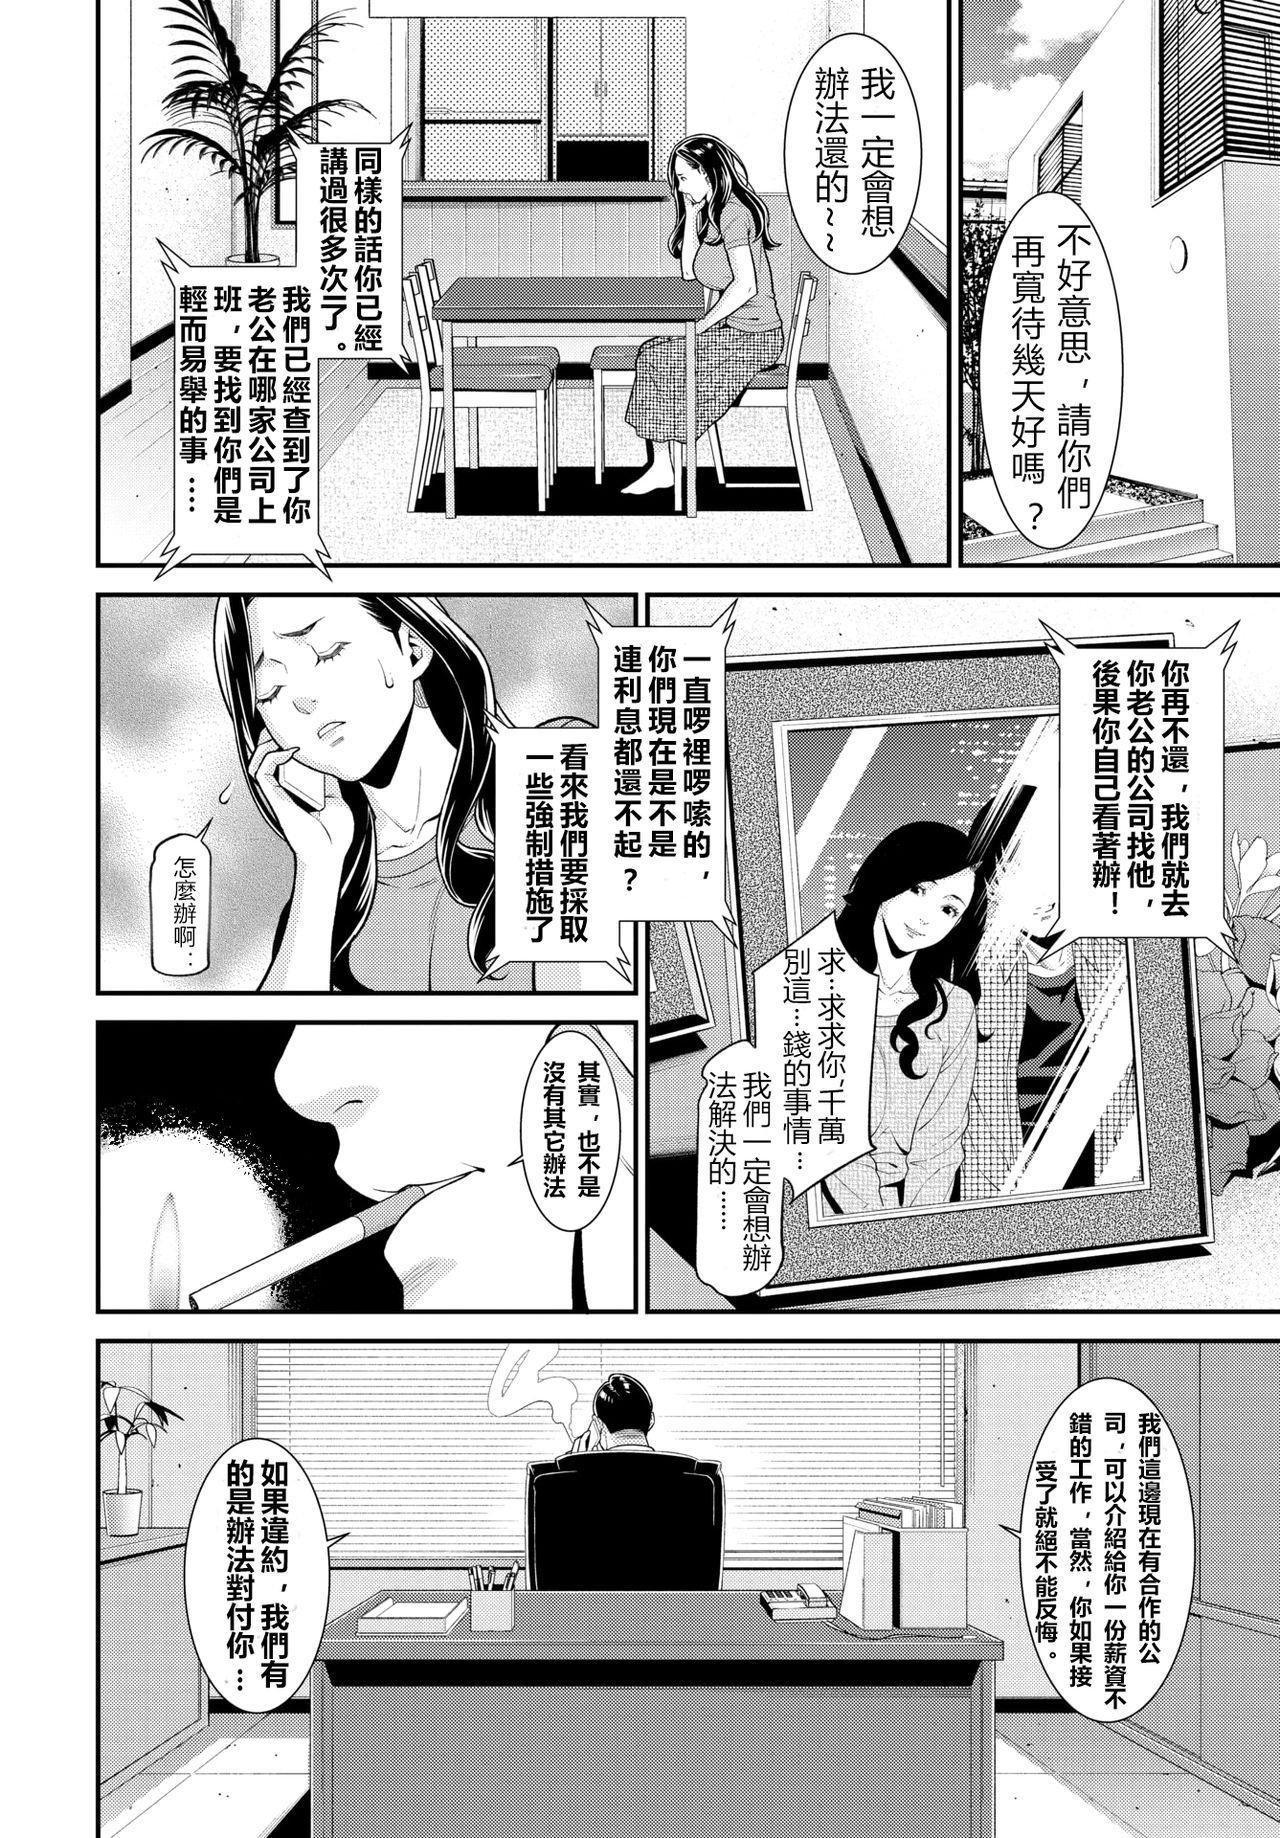 [Syuuen] Secret Wife  1-6 [Chinese][鼠灣漢化](210206最新修复完整版)【極品人妻NTR】 2